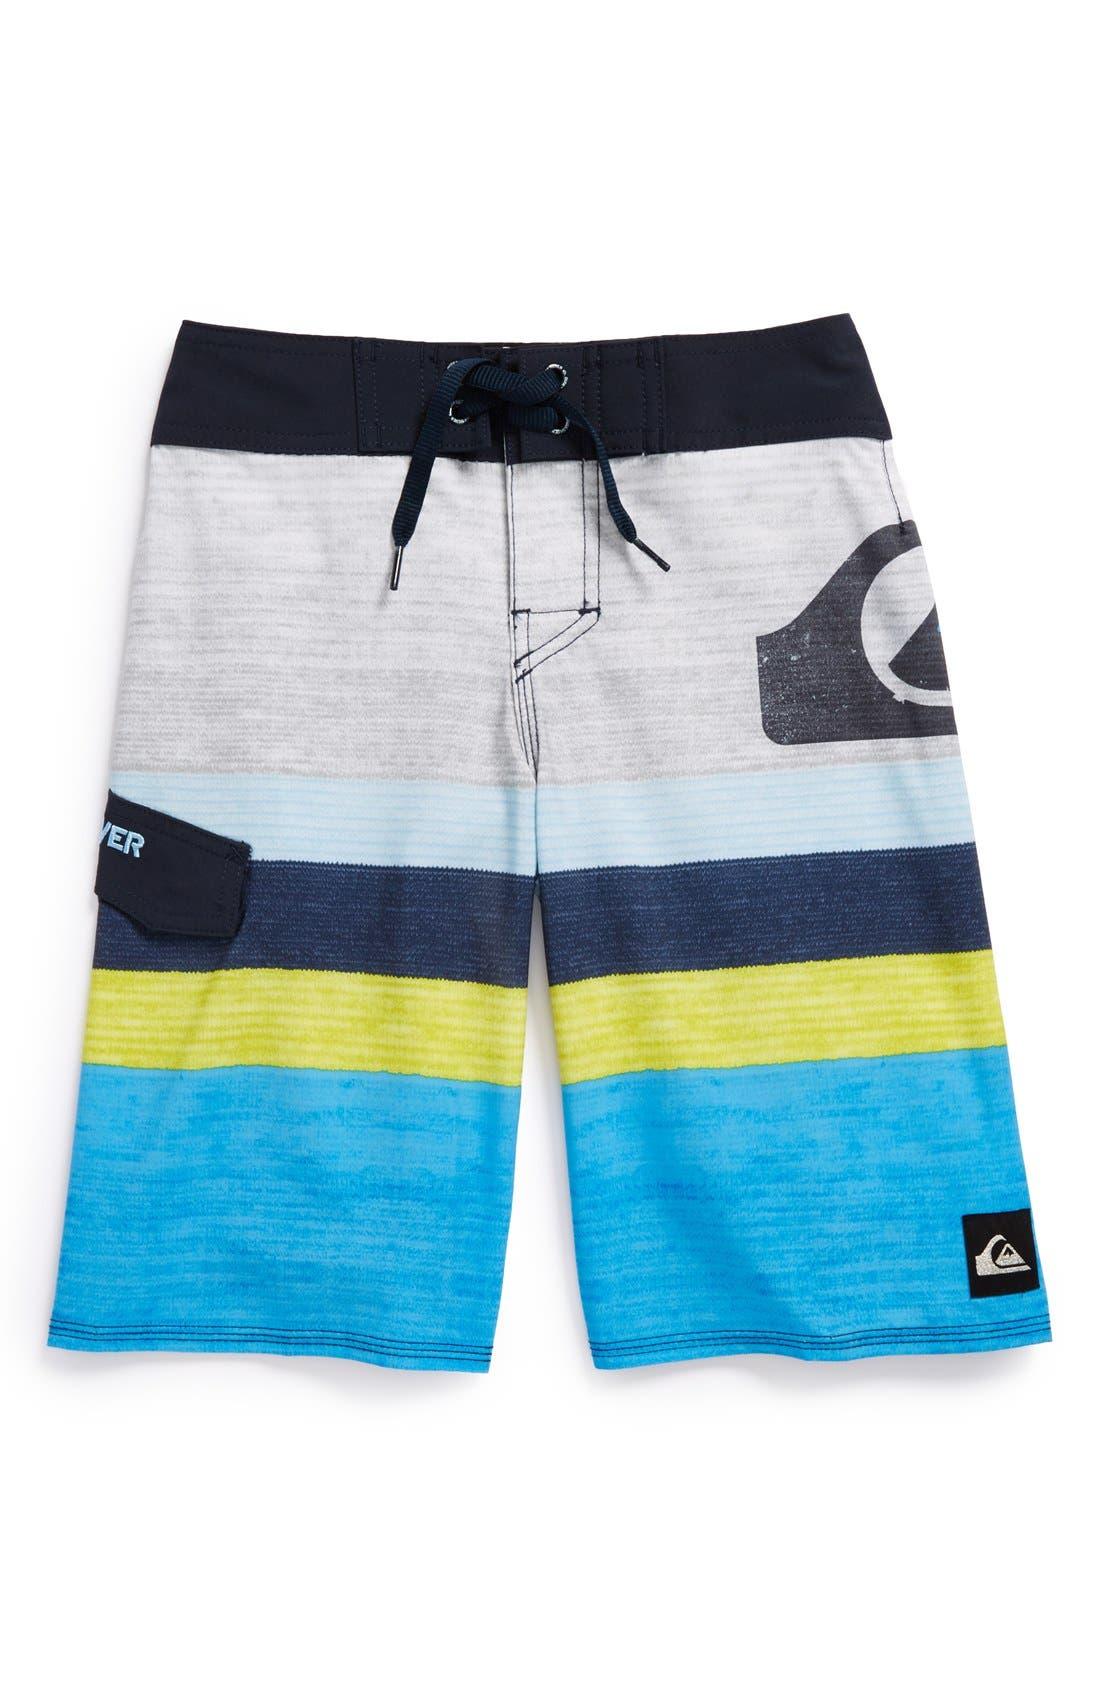 Main Image - Quiksilver 'Slater' Board Shorts (Little Boys & Big Boys)